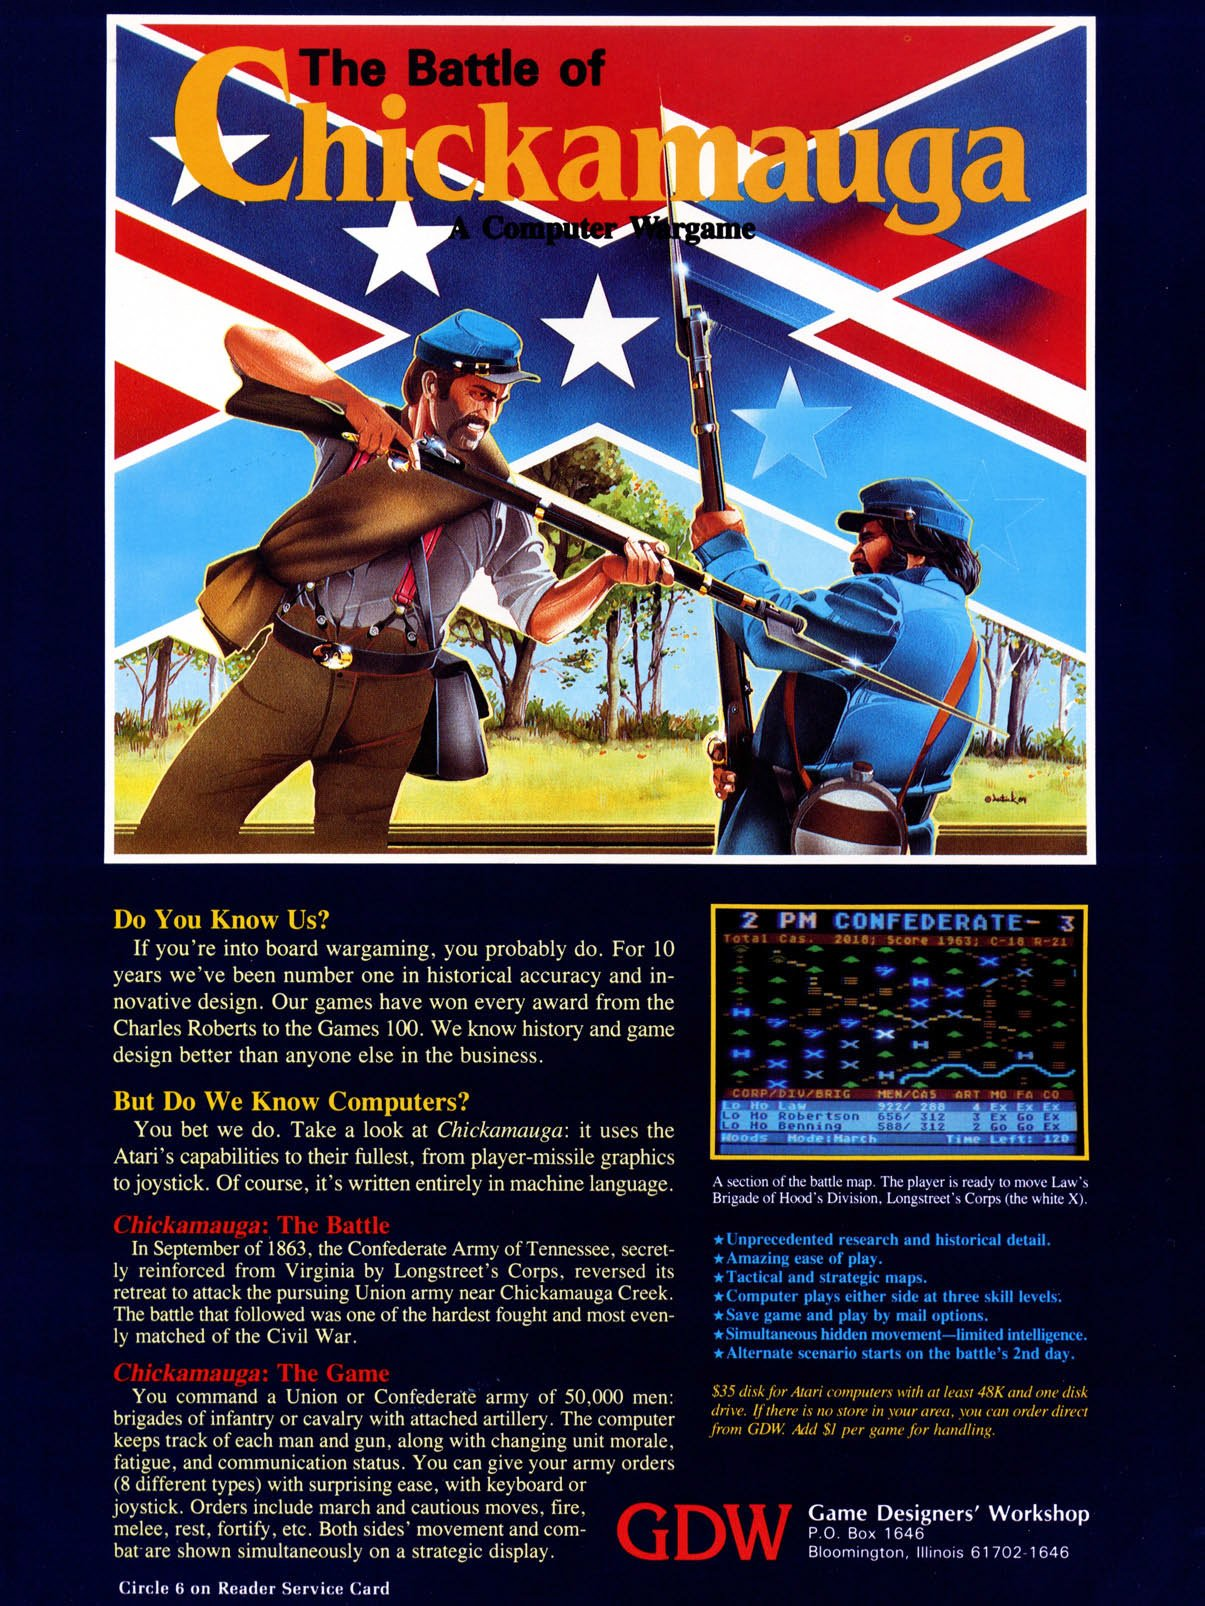 Battle of Chickamauga, The